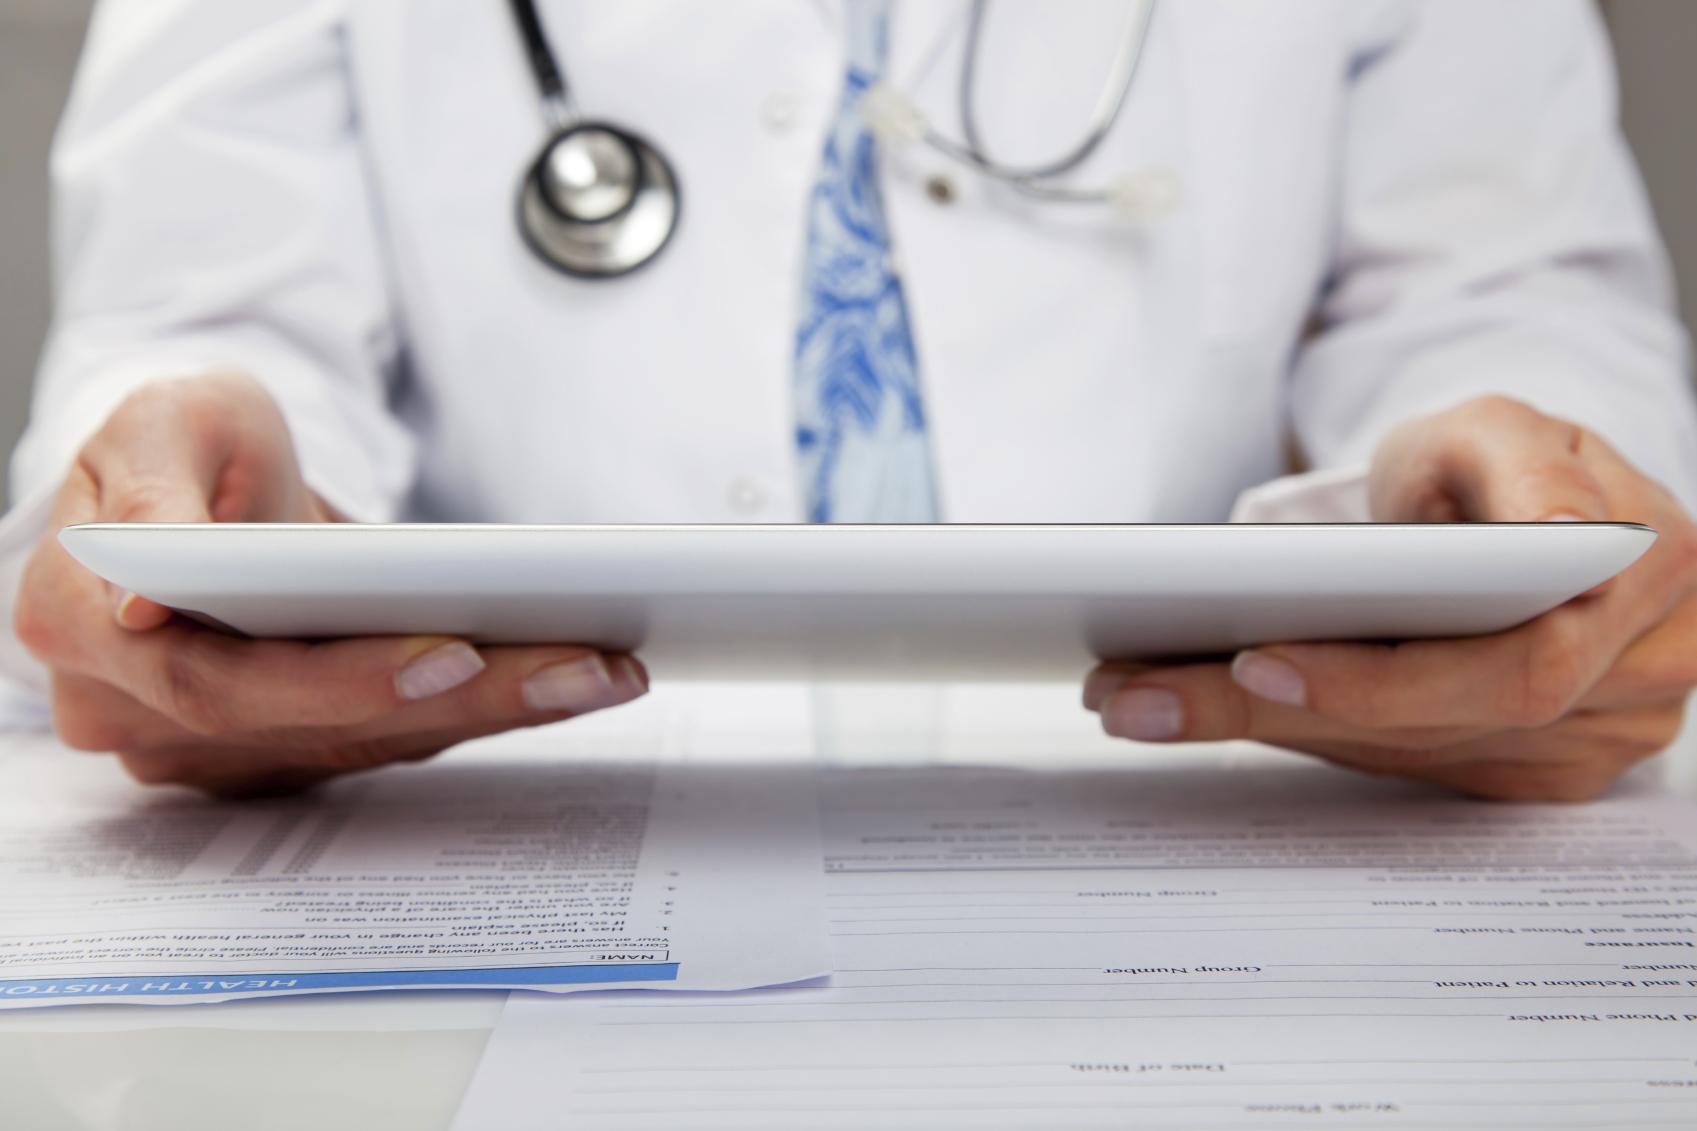 iStock_000022075098Medium_Woman-with-Tablet